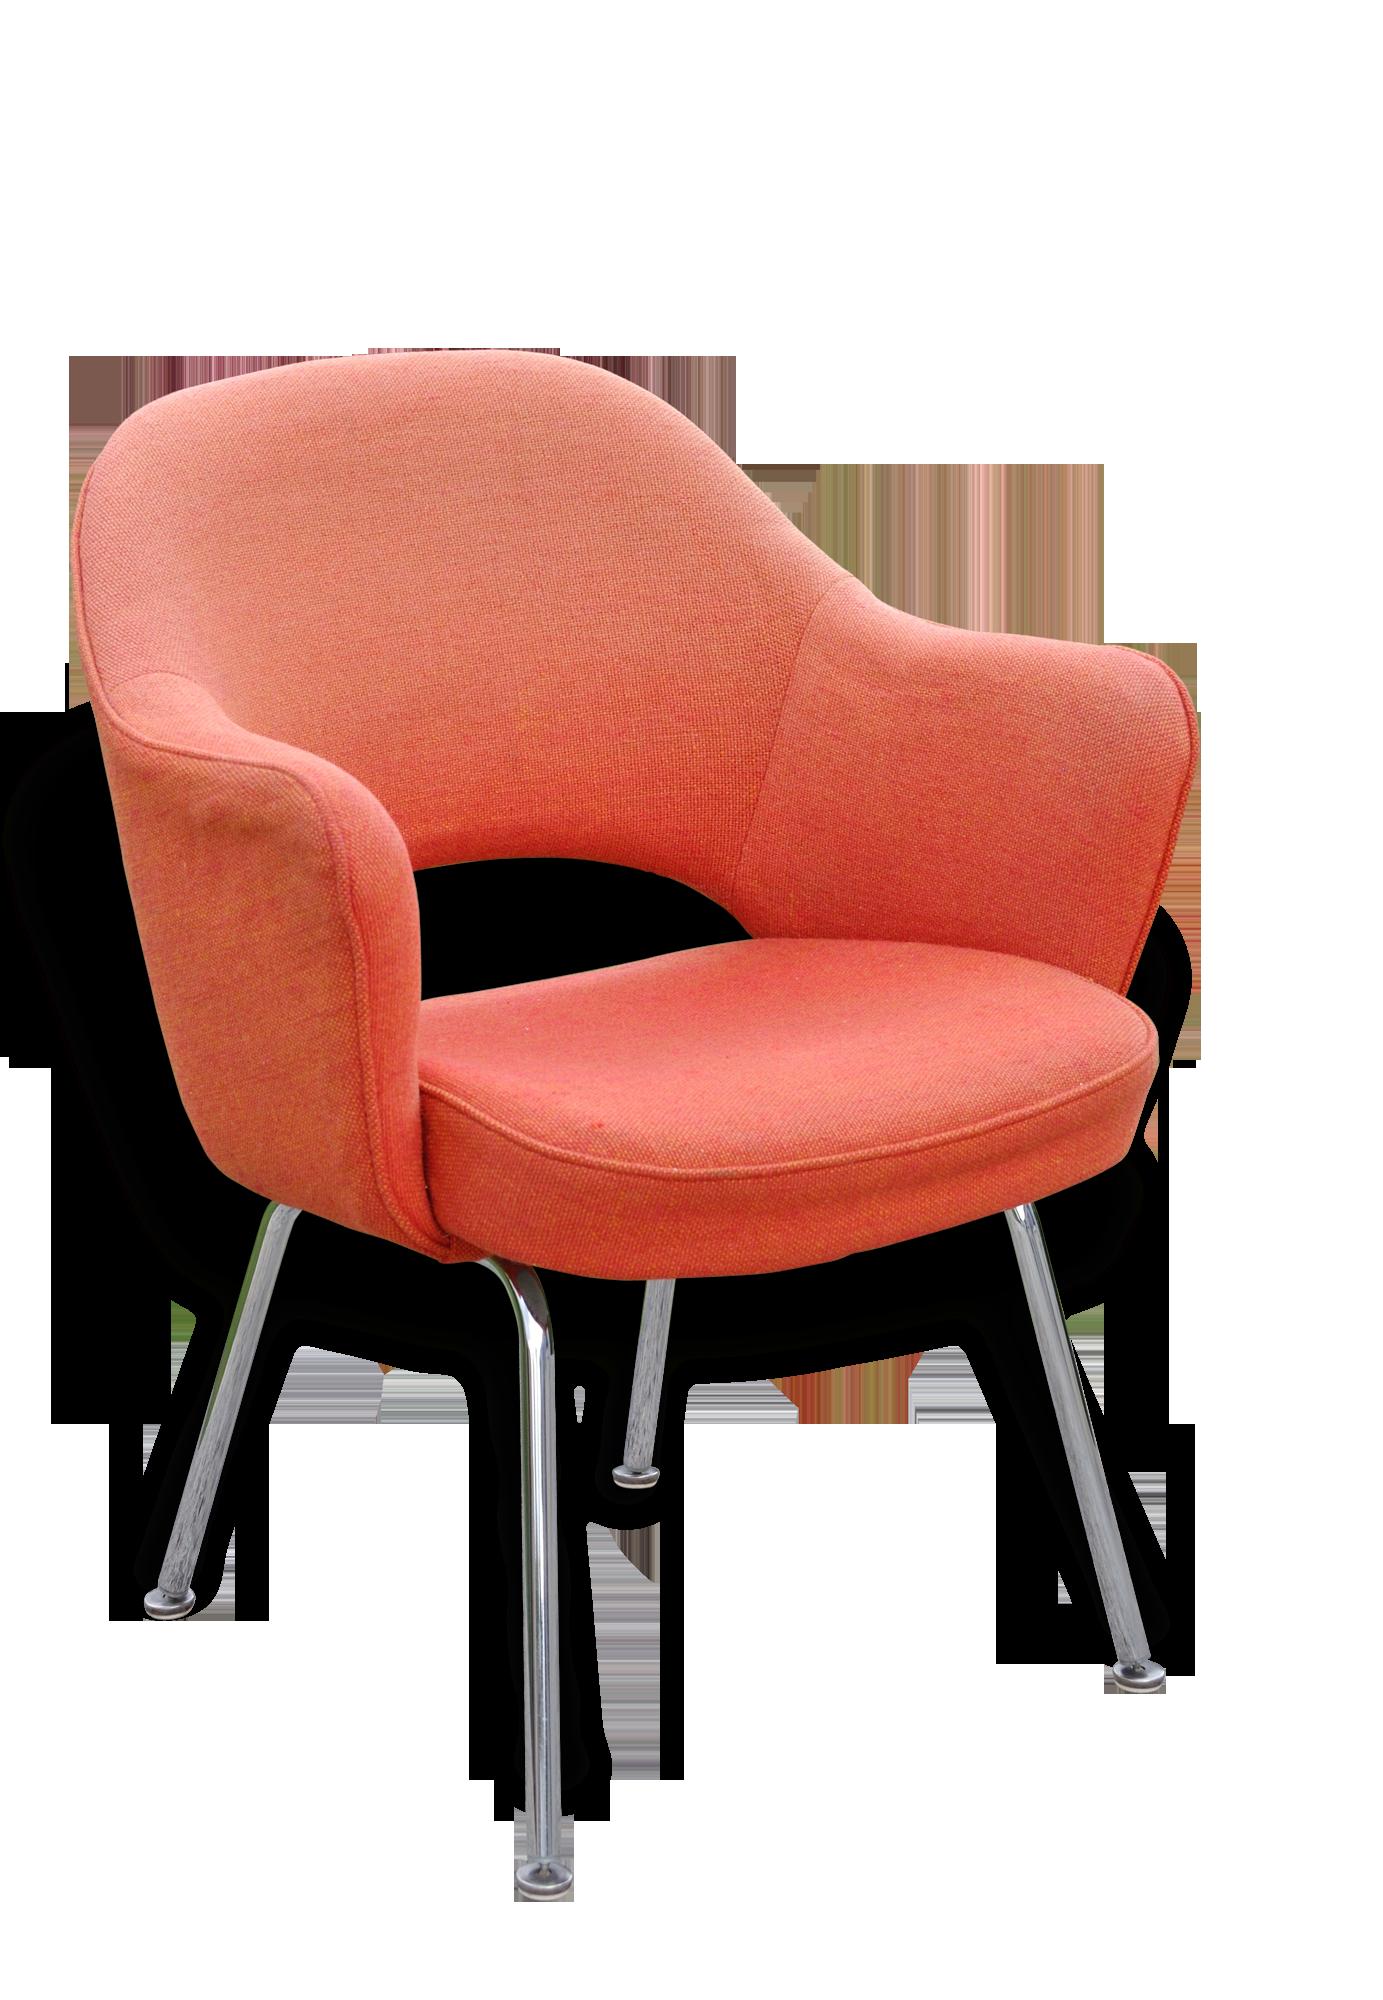 Chaise fauteuil bureau conference vintage saarinen knoll